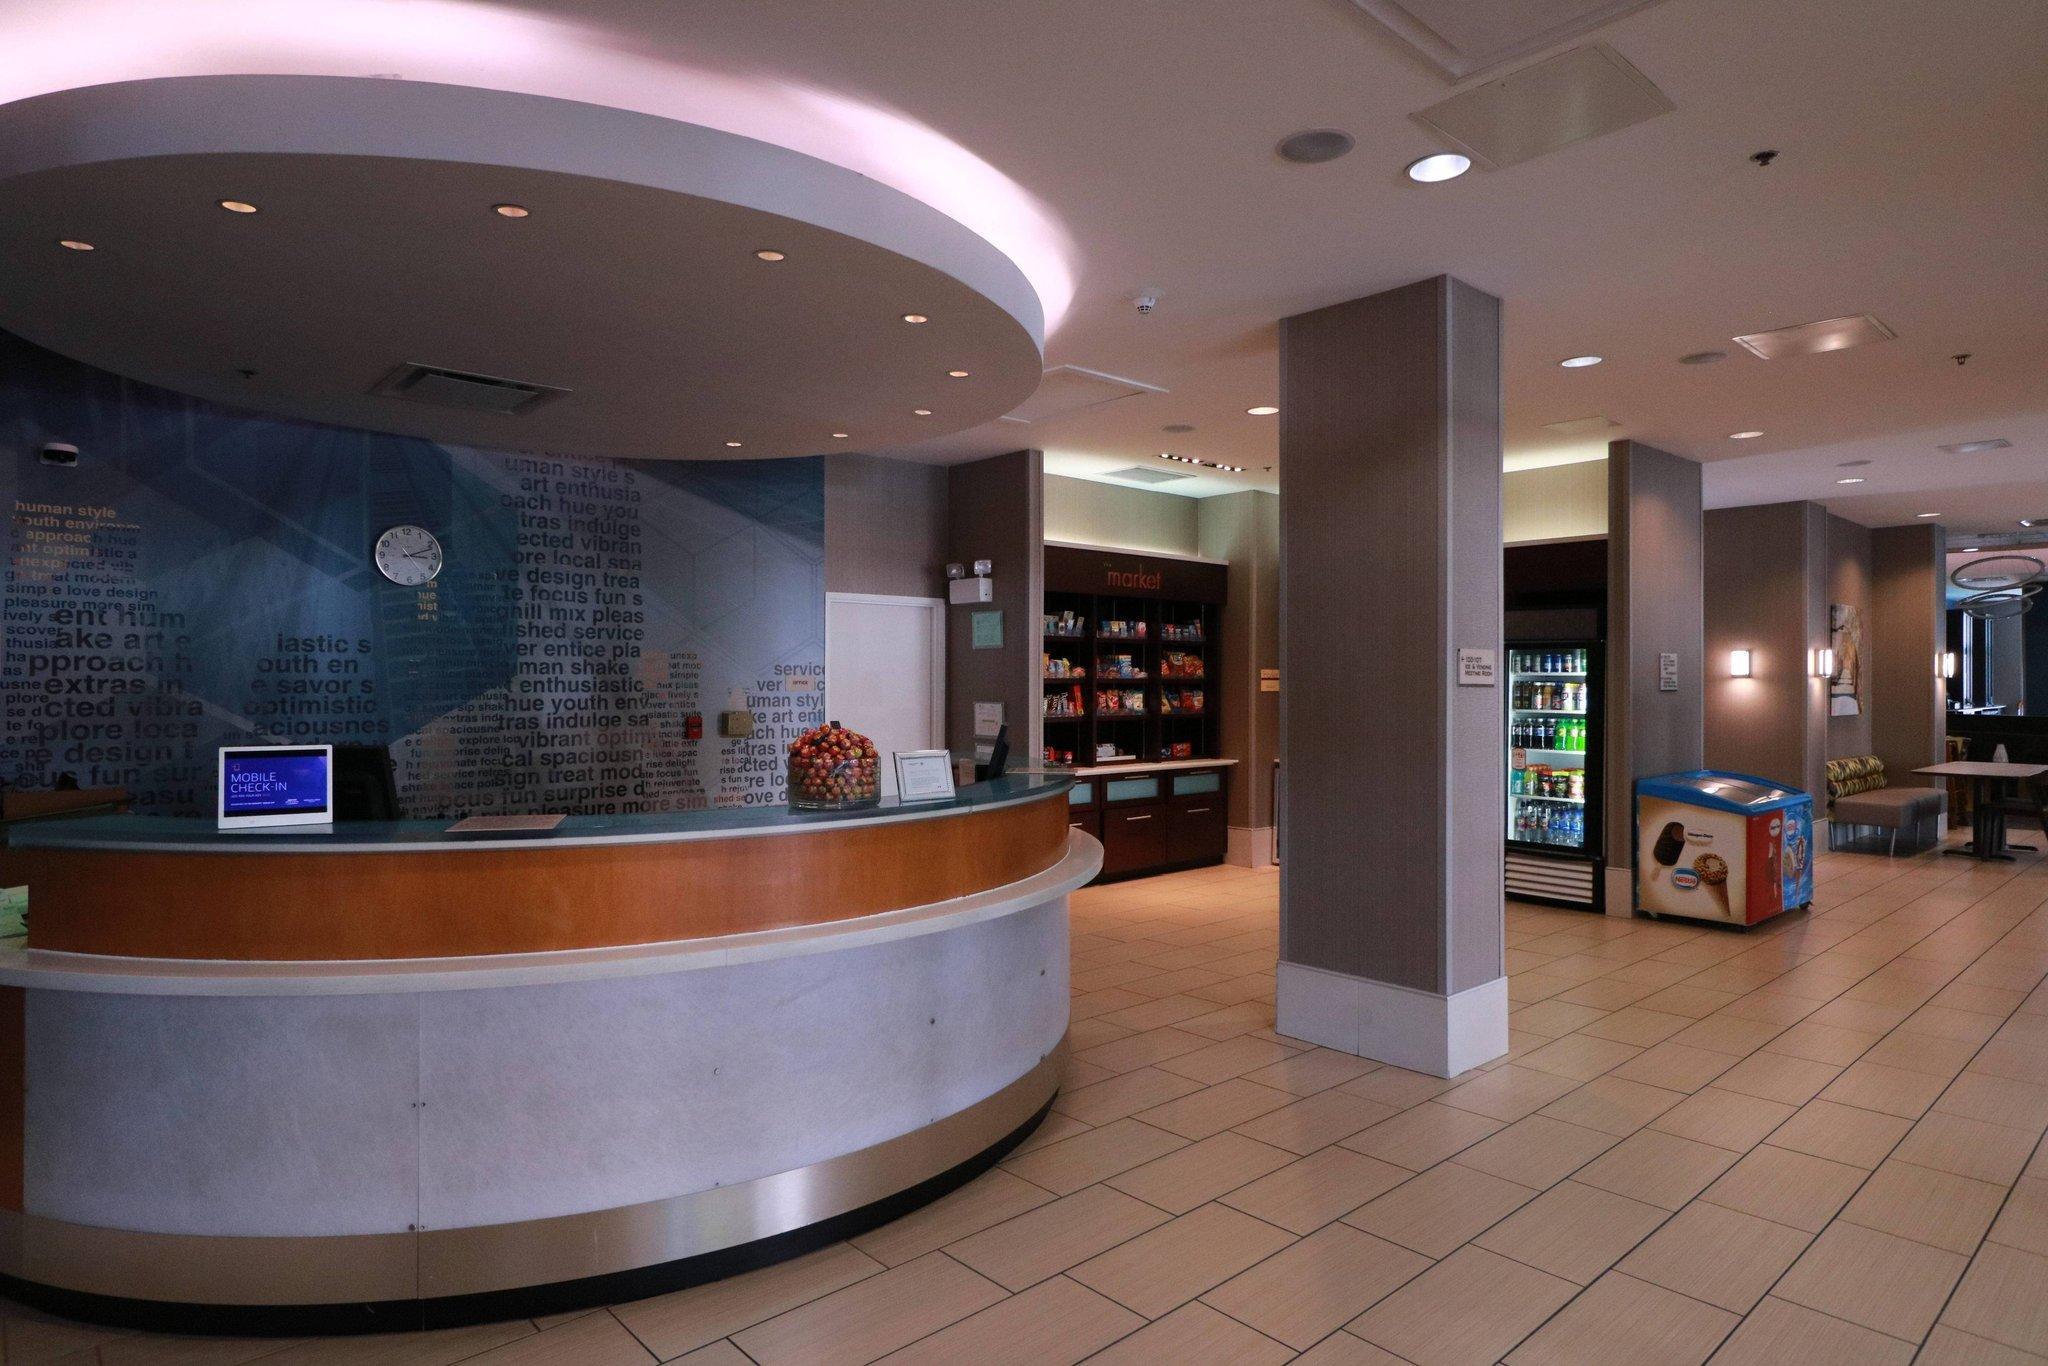 SpringHill Suites San Antonio Alamo Plaza Convention Center